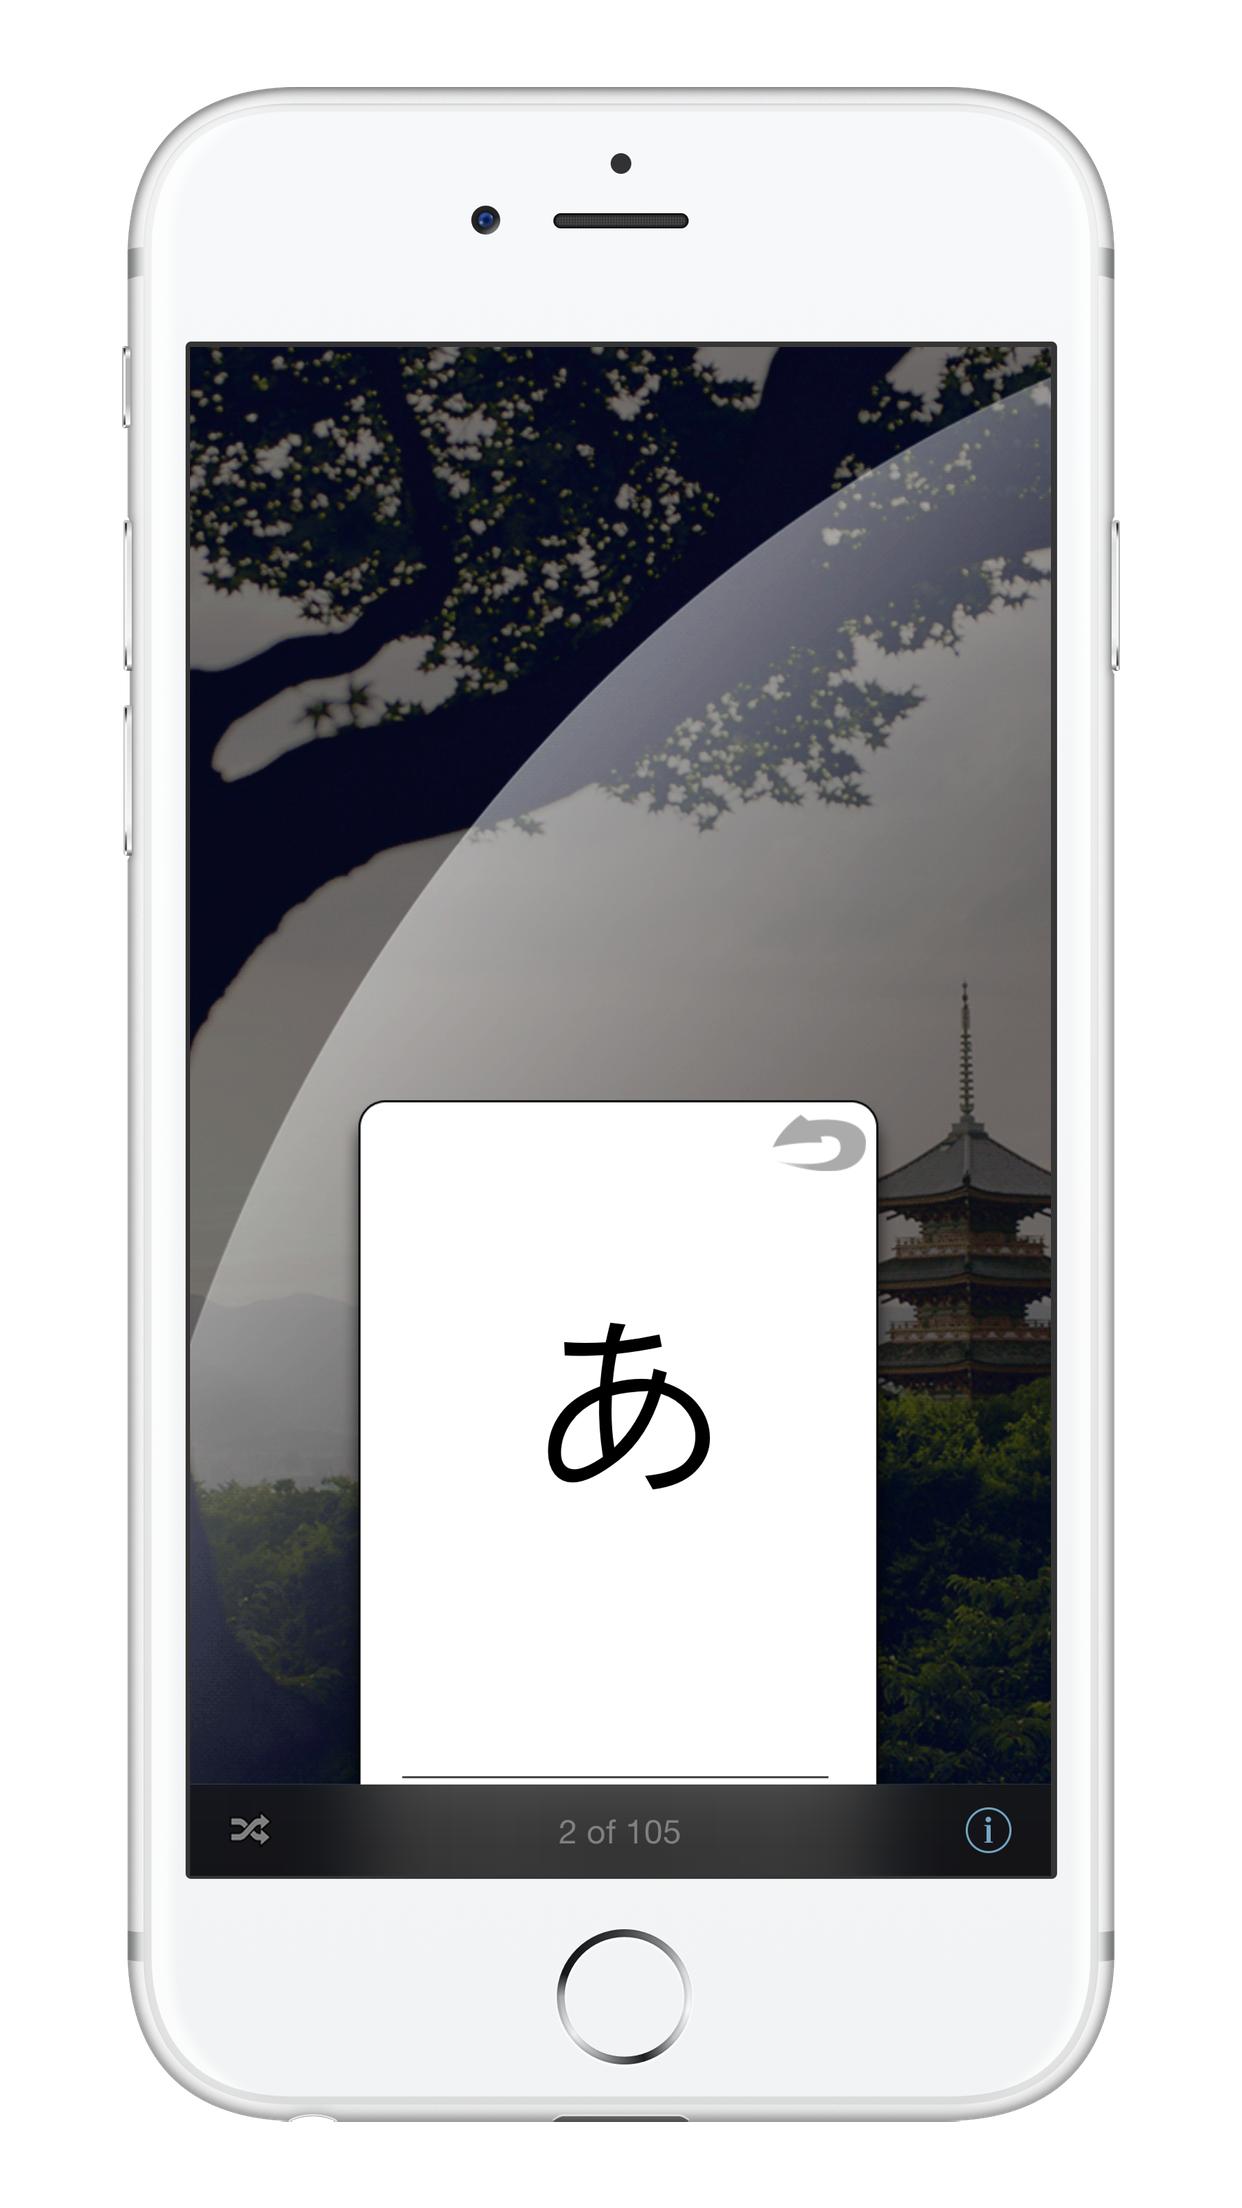 Hiragana screenshot 1.png